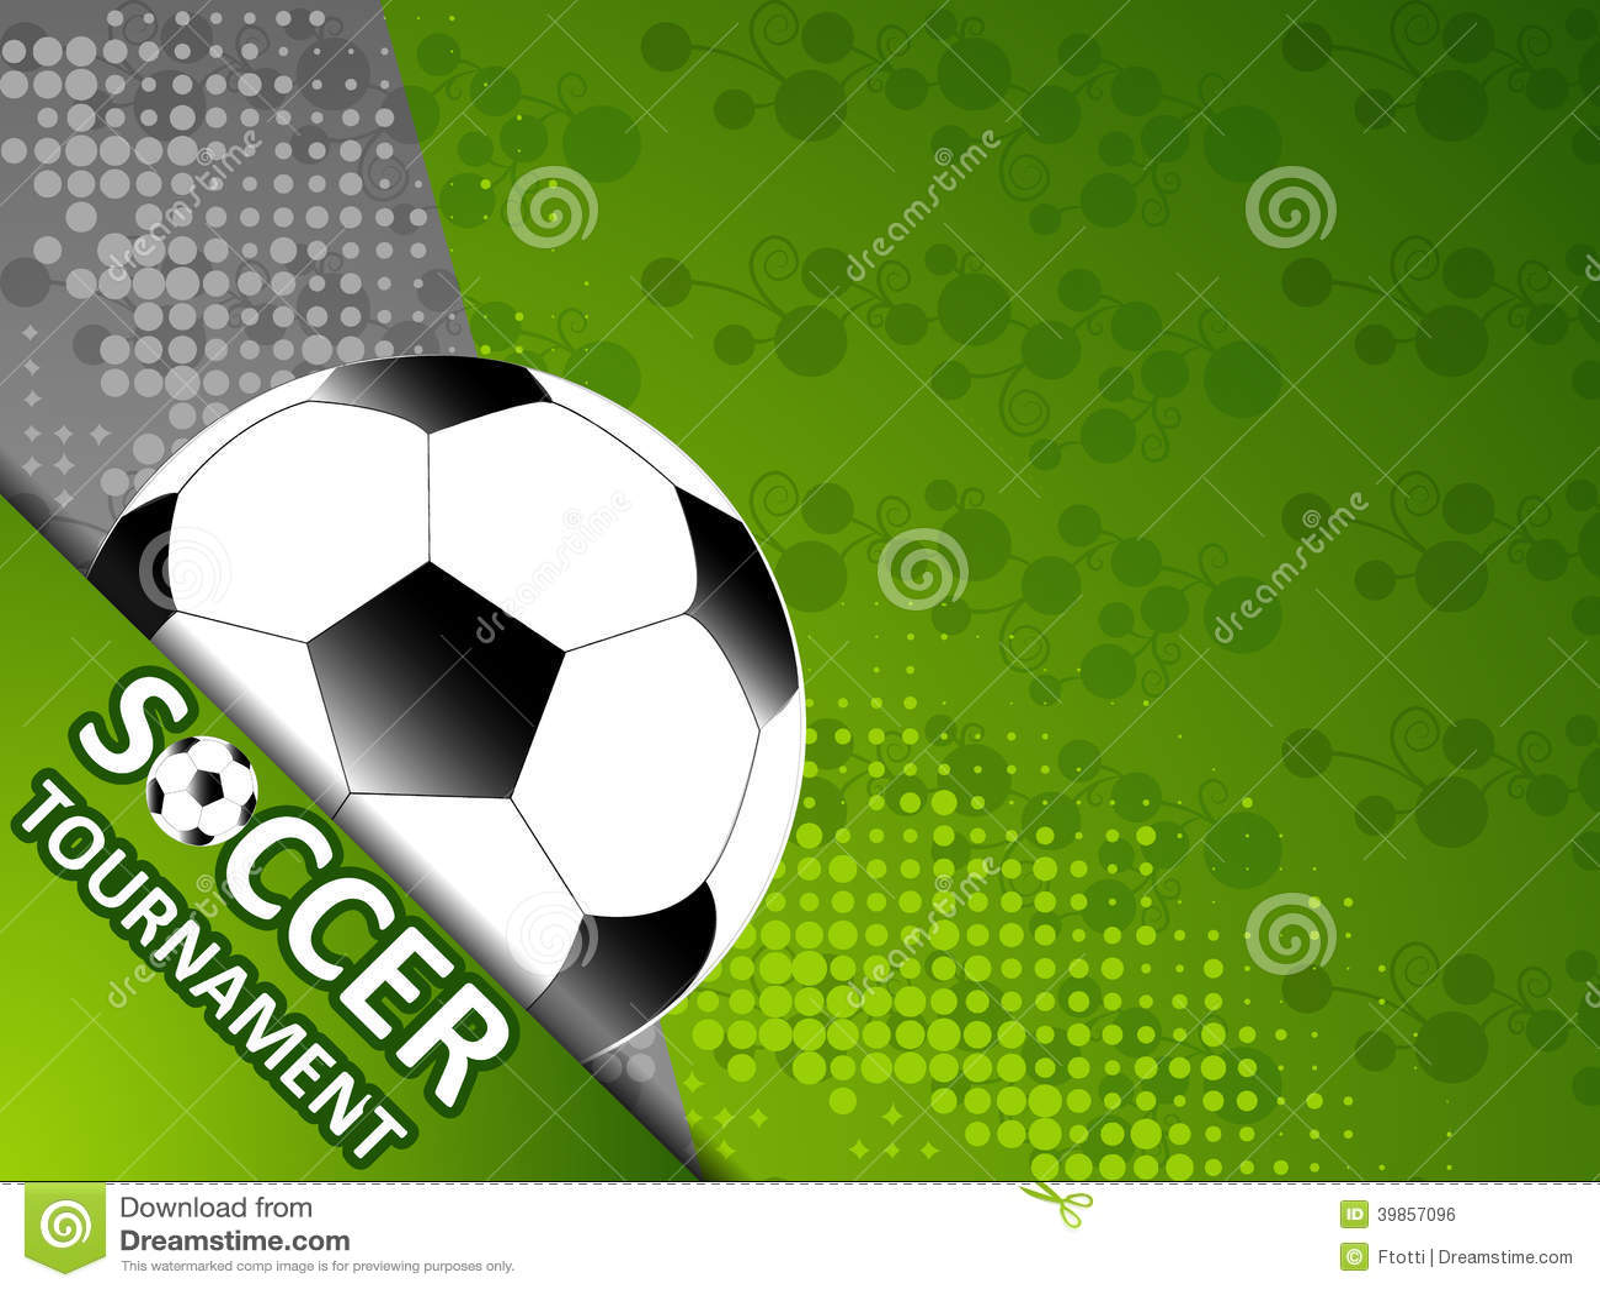 soccer invitation templates free juve cenitdelacabrera co